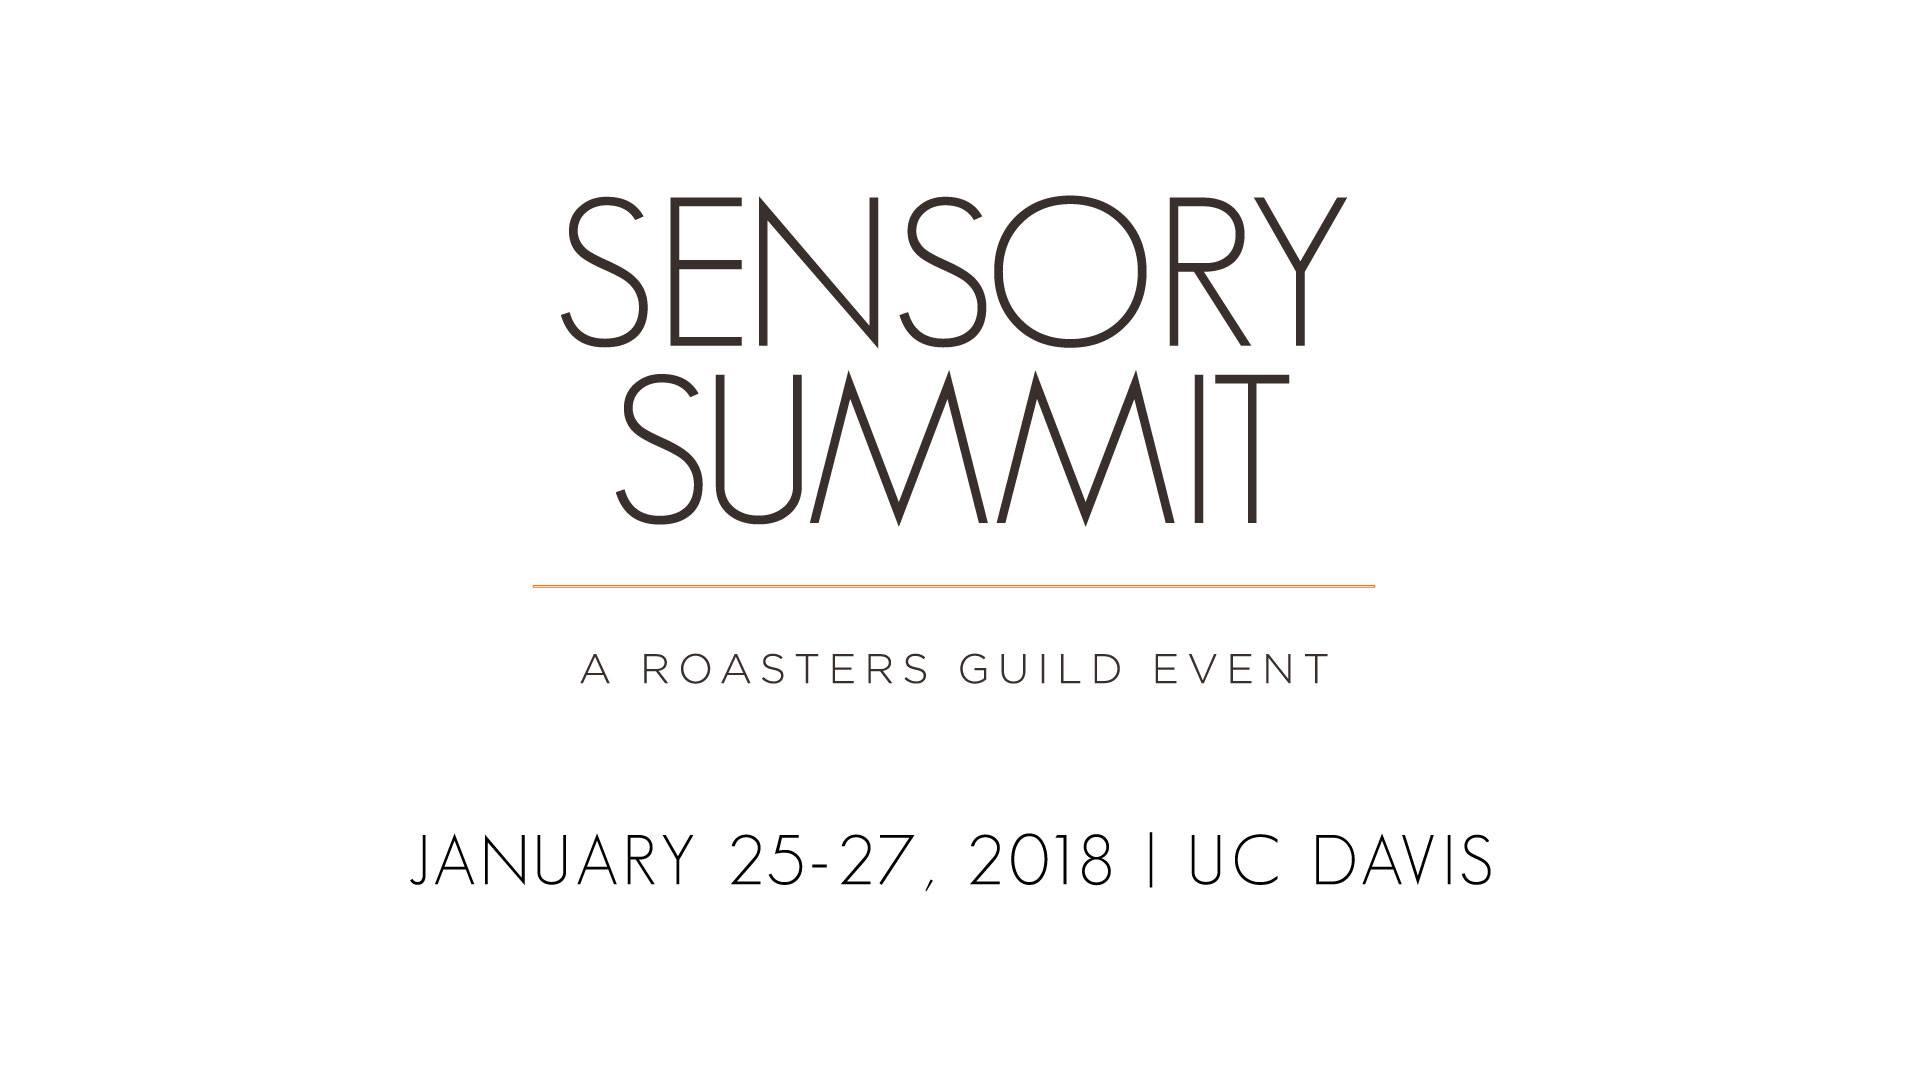 UC Davis Robert Mondavi / Sensory Summit 2018